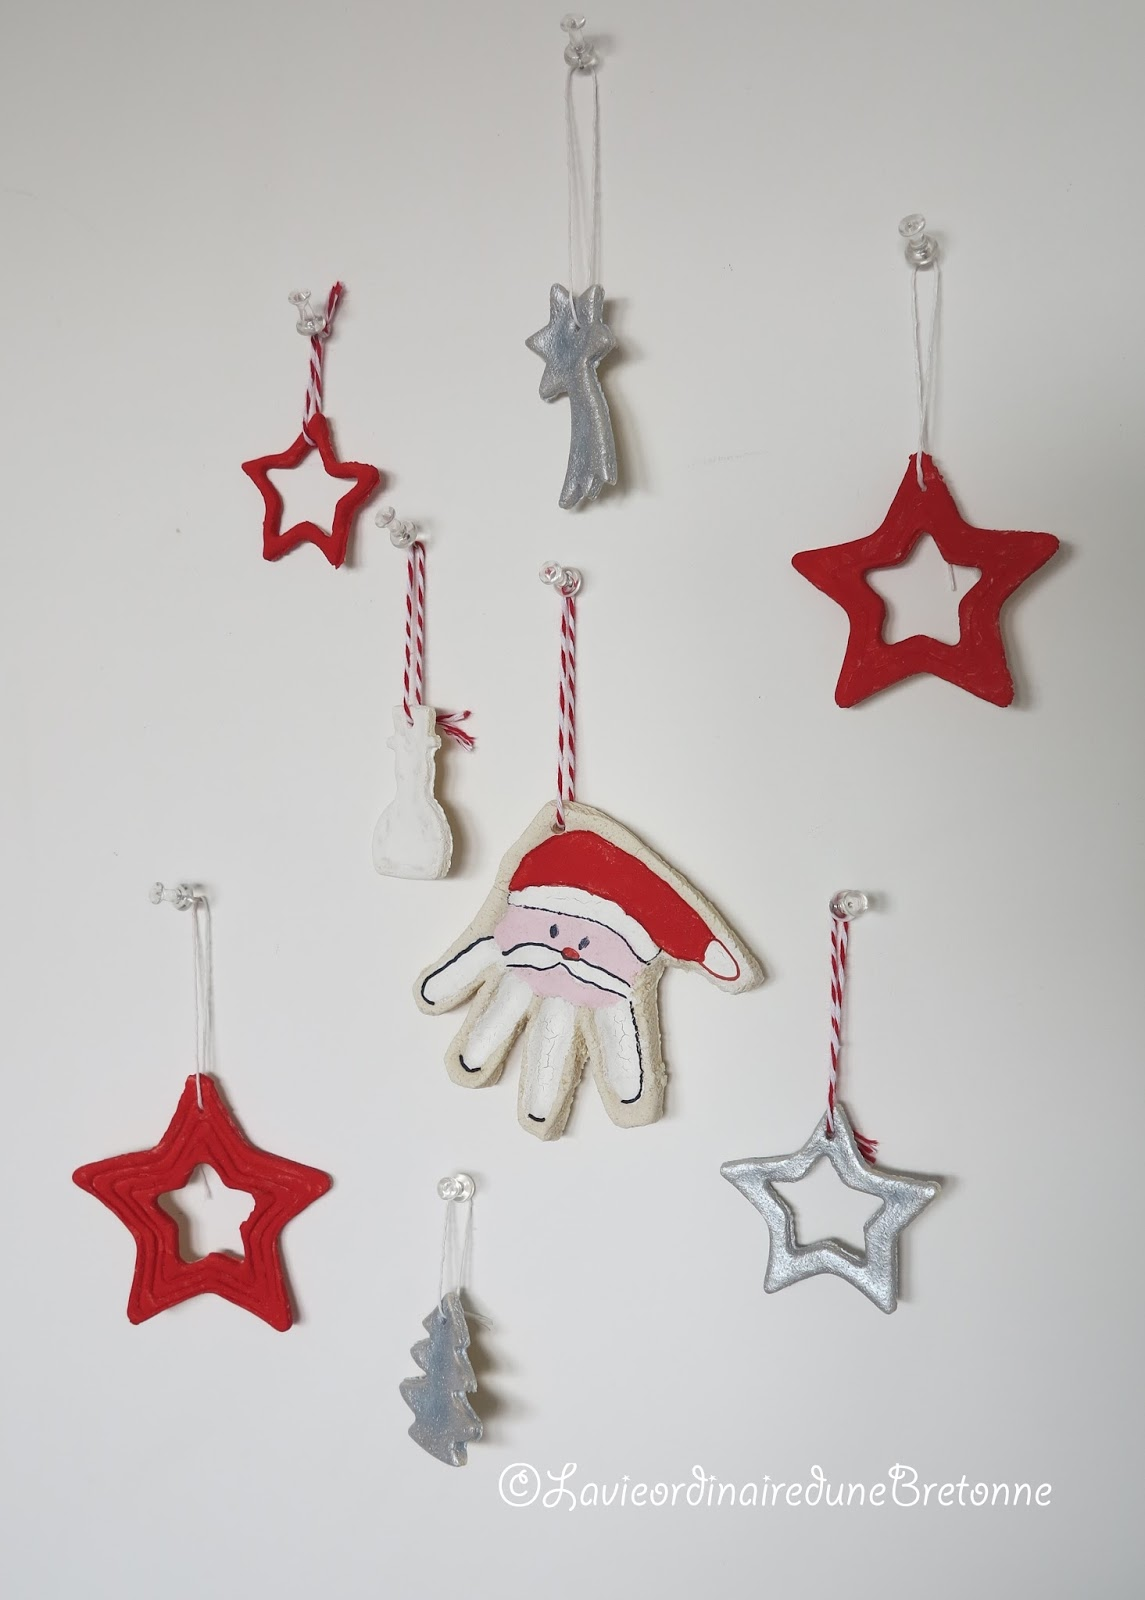 Les Decorations Particulieres De Noel